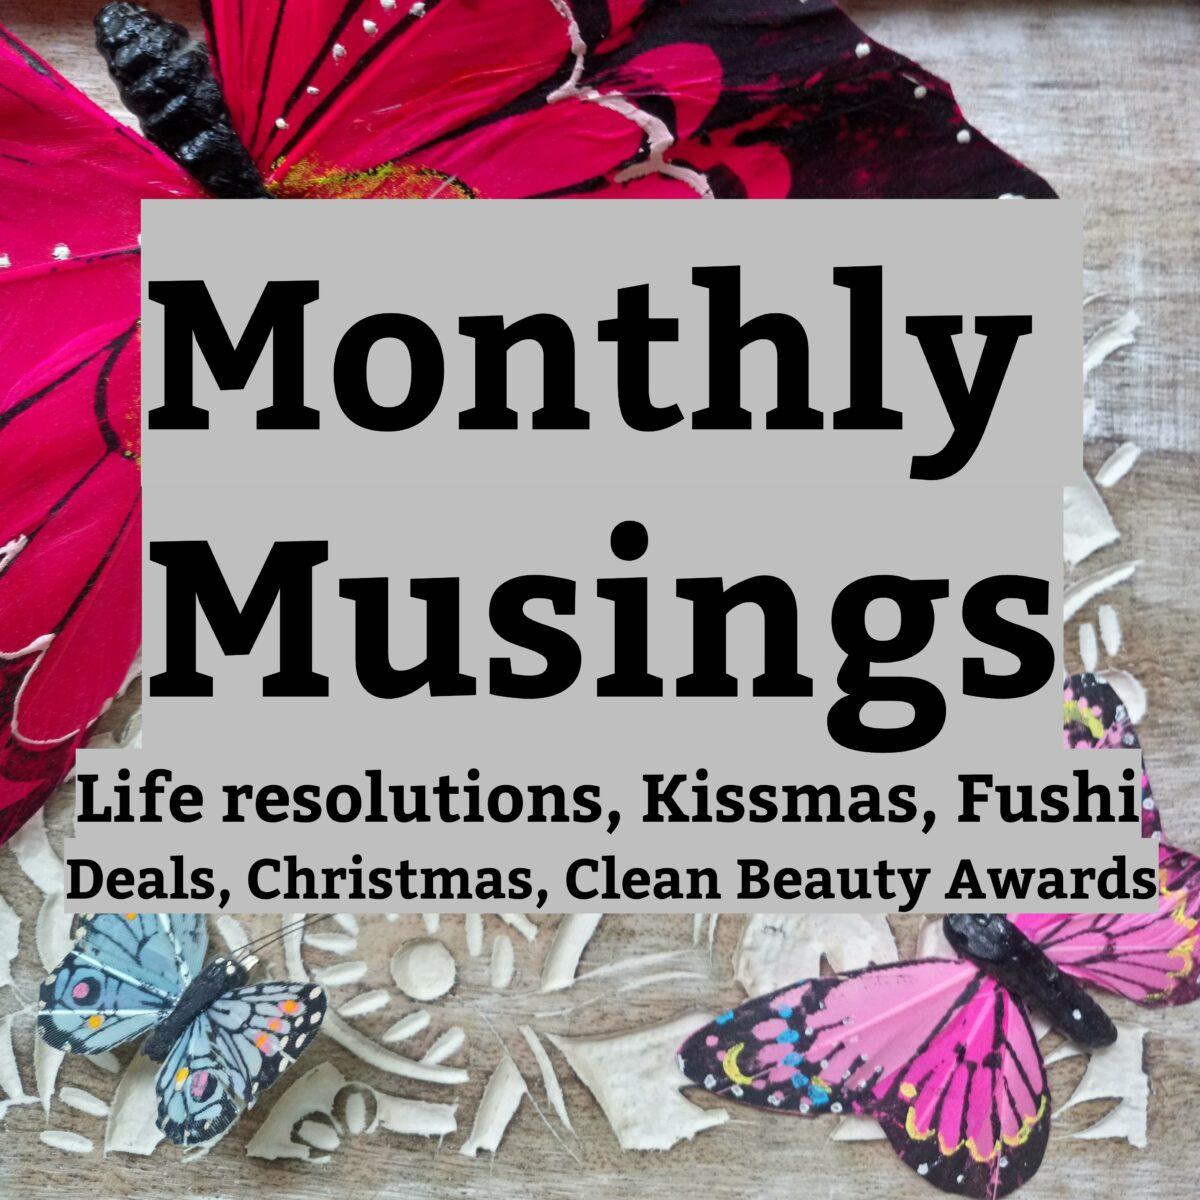 Monthly Musings – December 2019